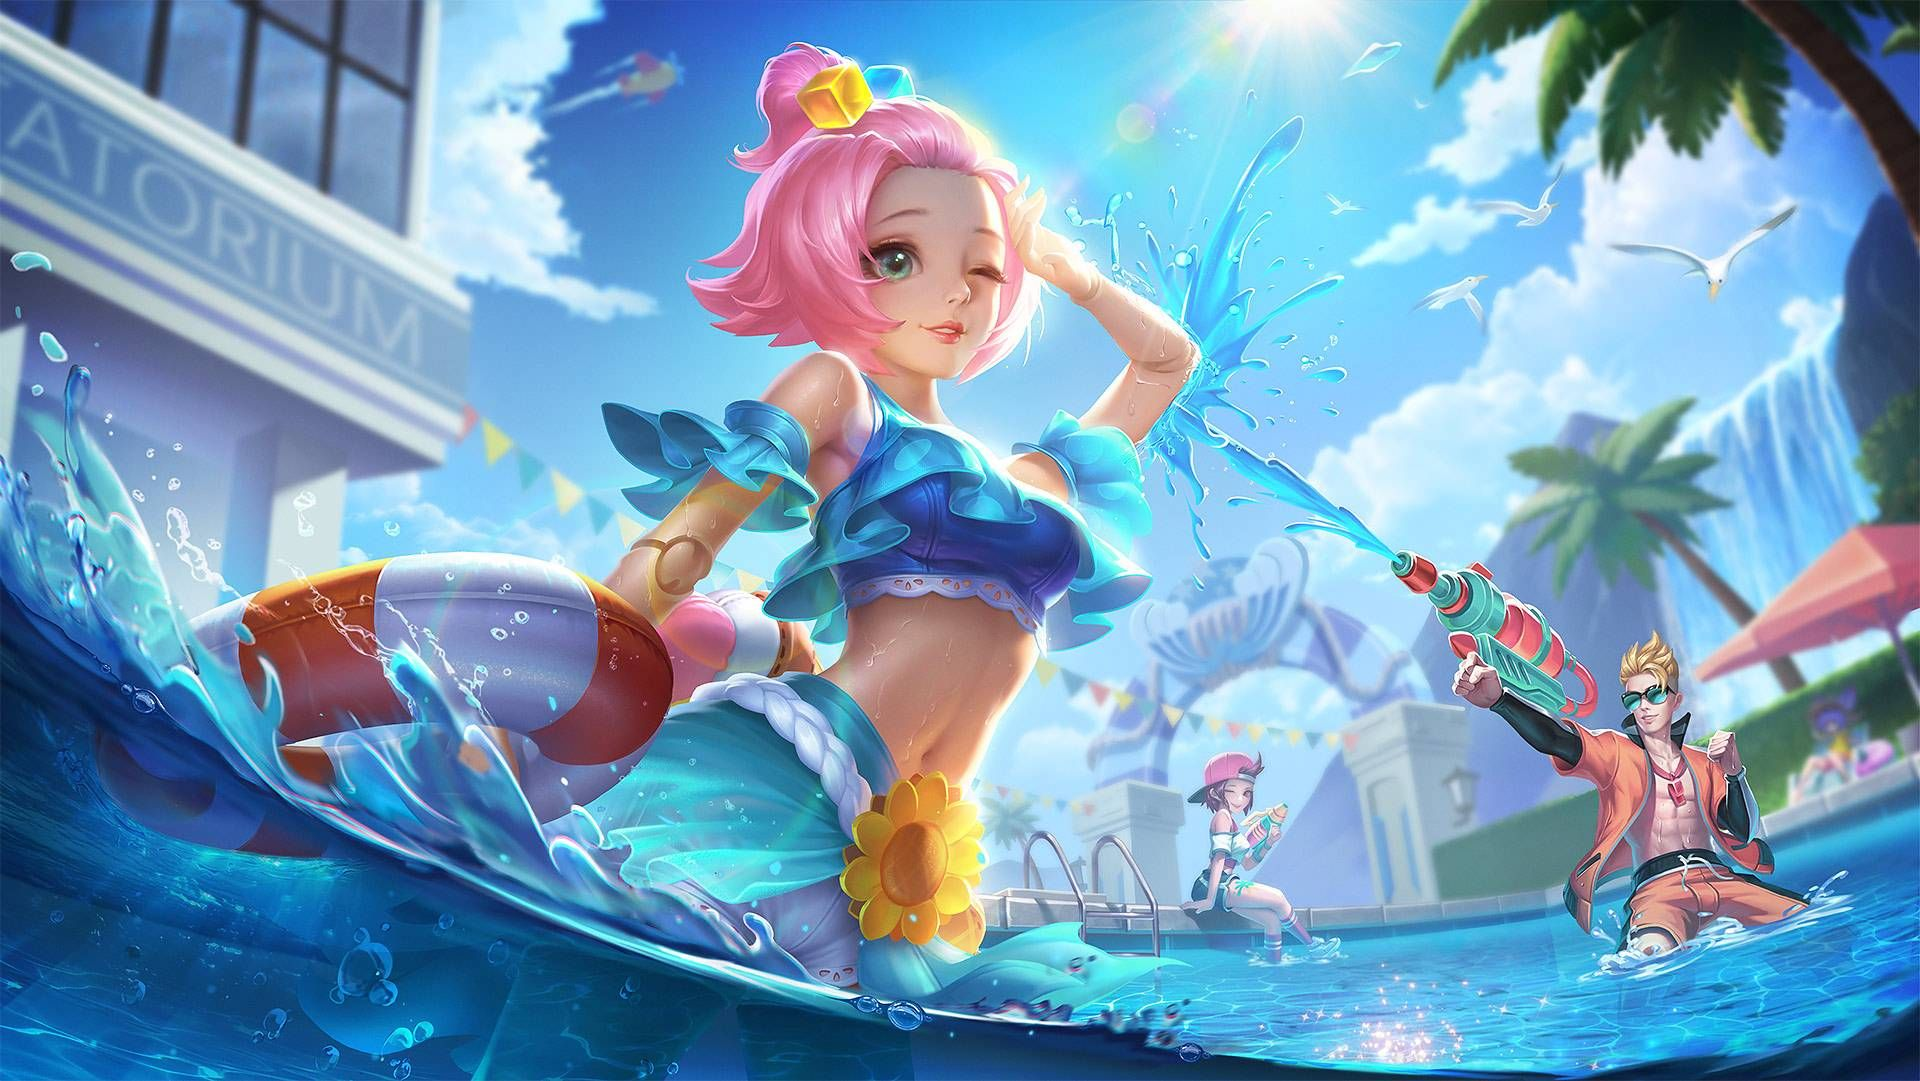 Angela Summer Vibes Wallpaper by ZeroGaro in 2021 1920x1081